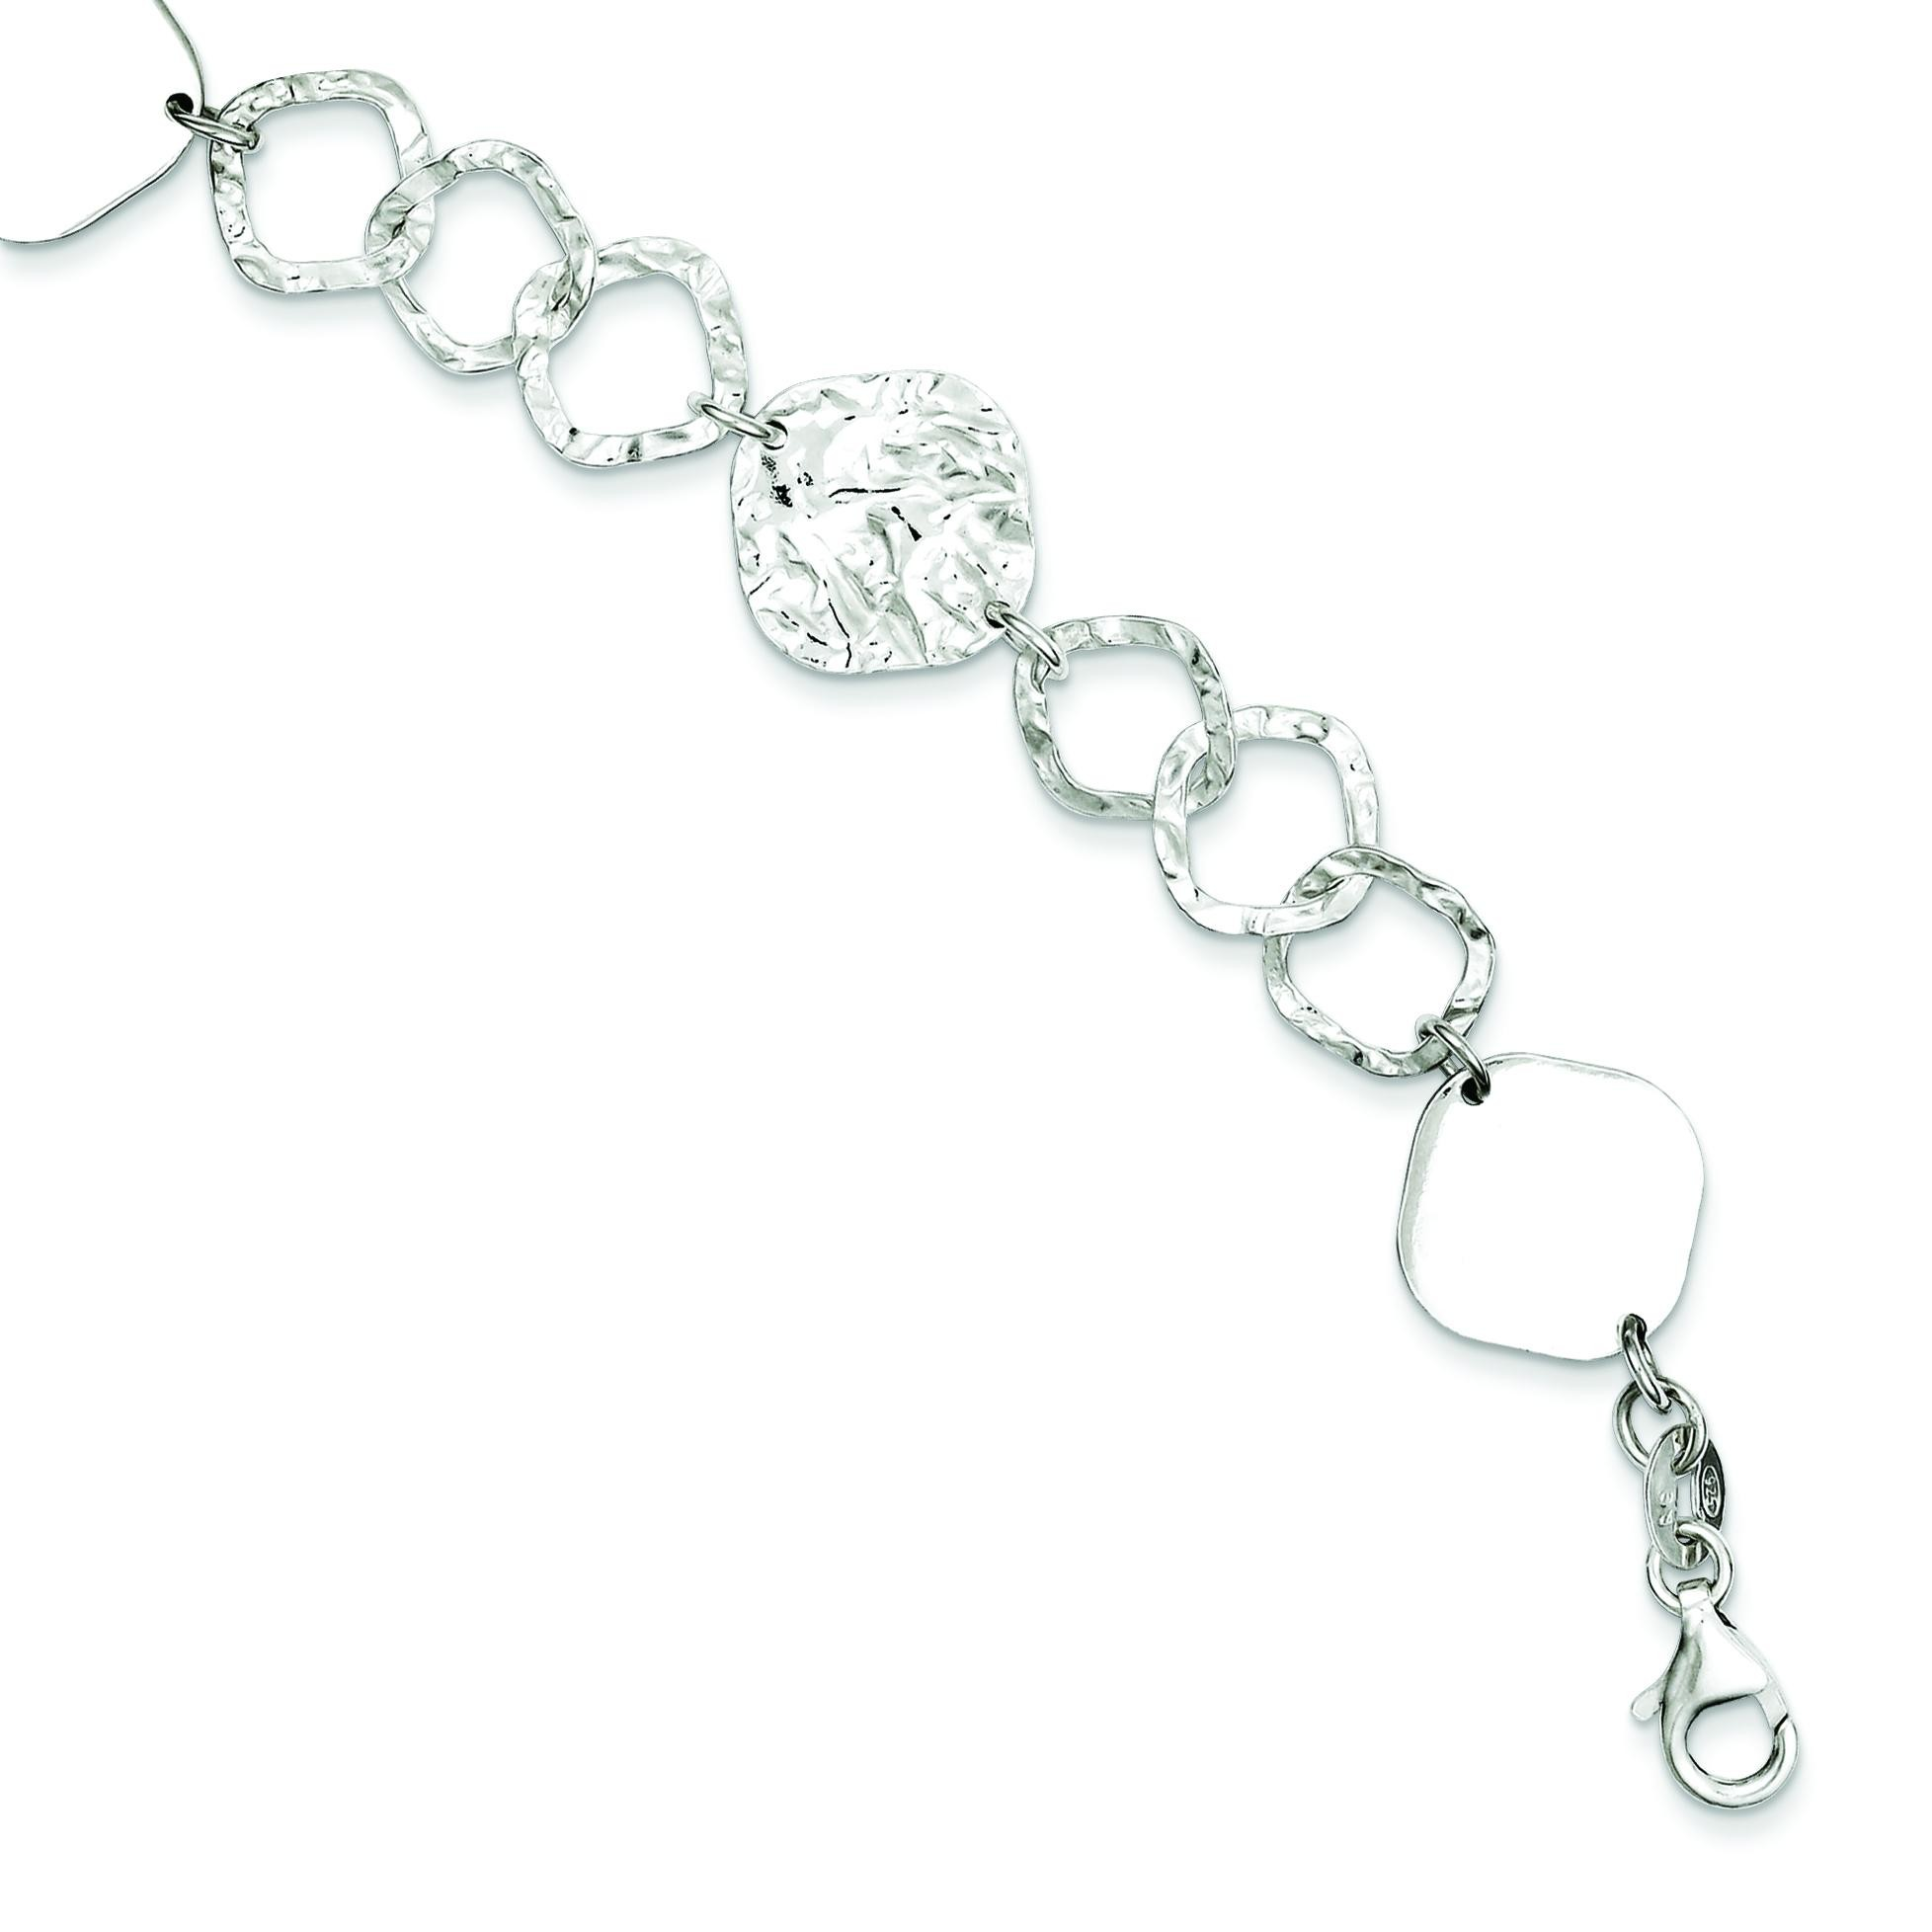 Polished Fancy Link Bracelet in Sterling Silver